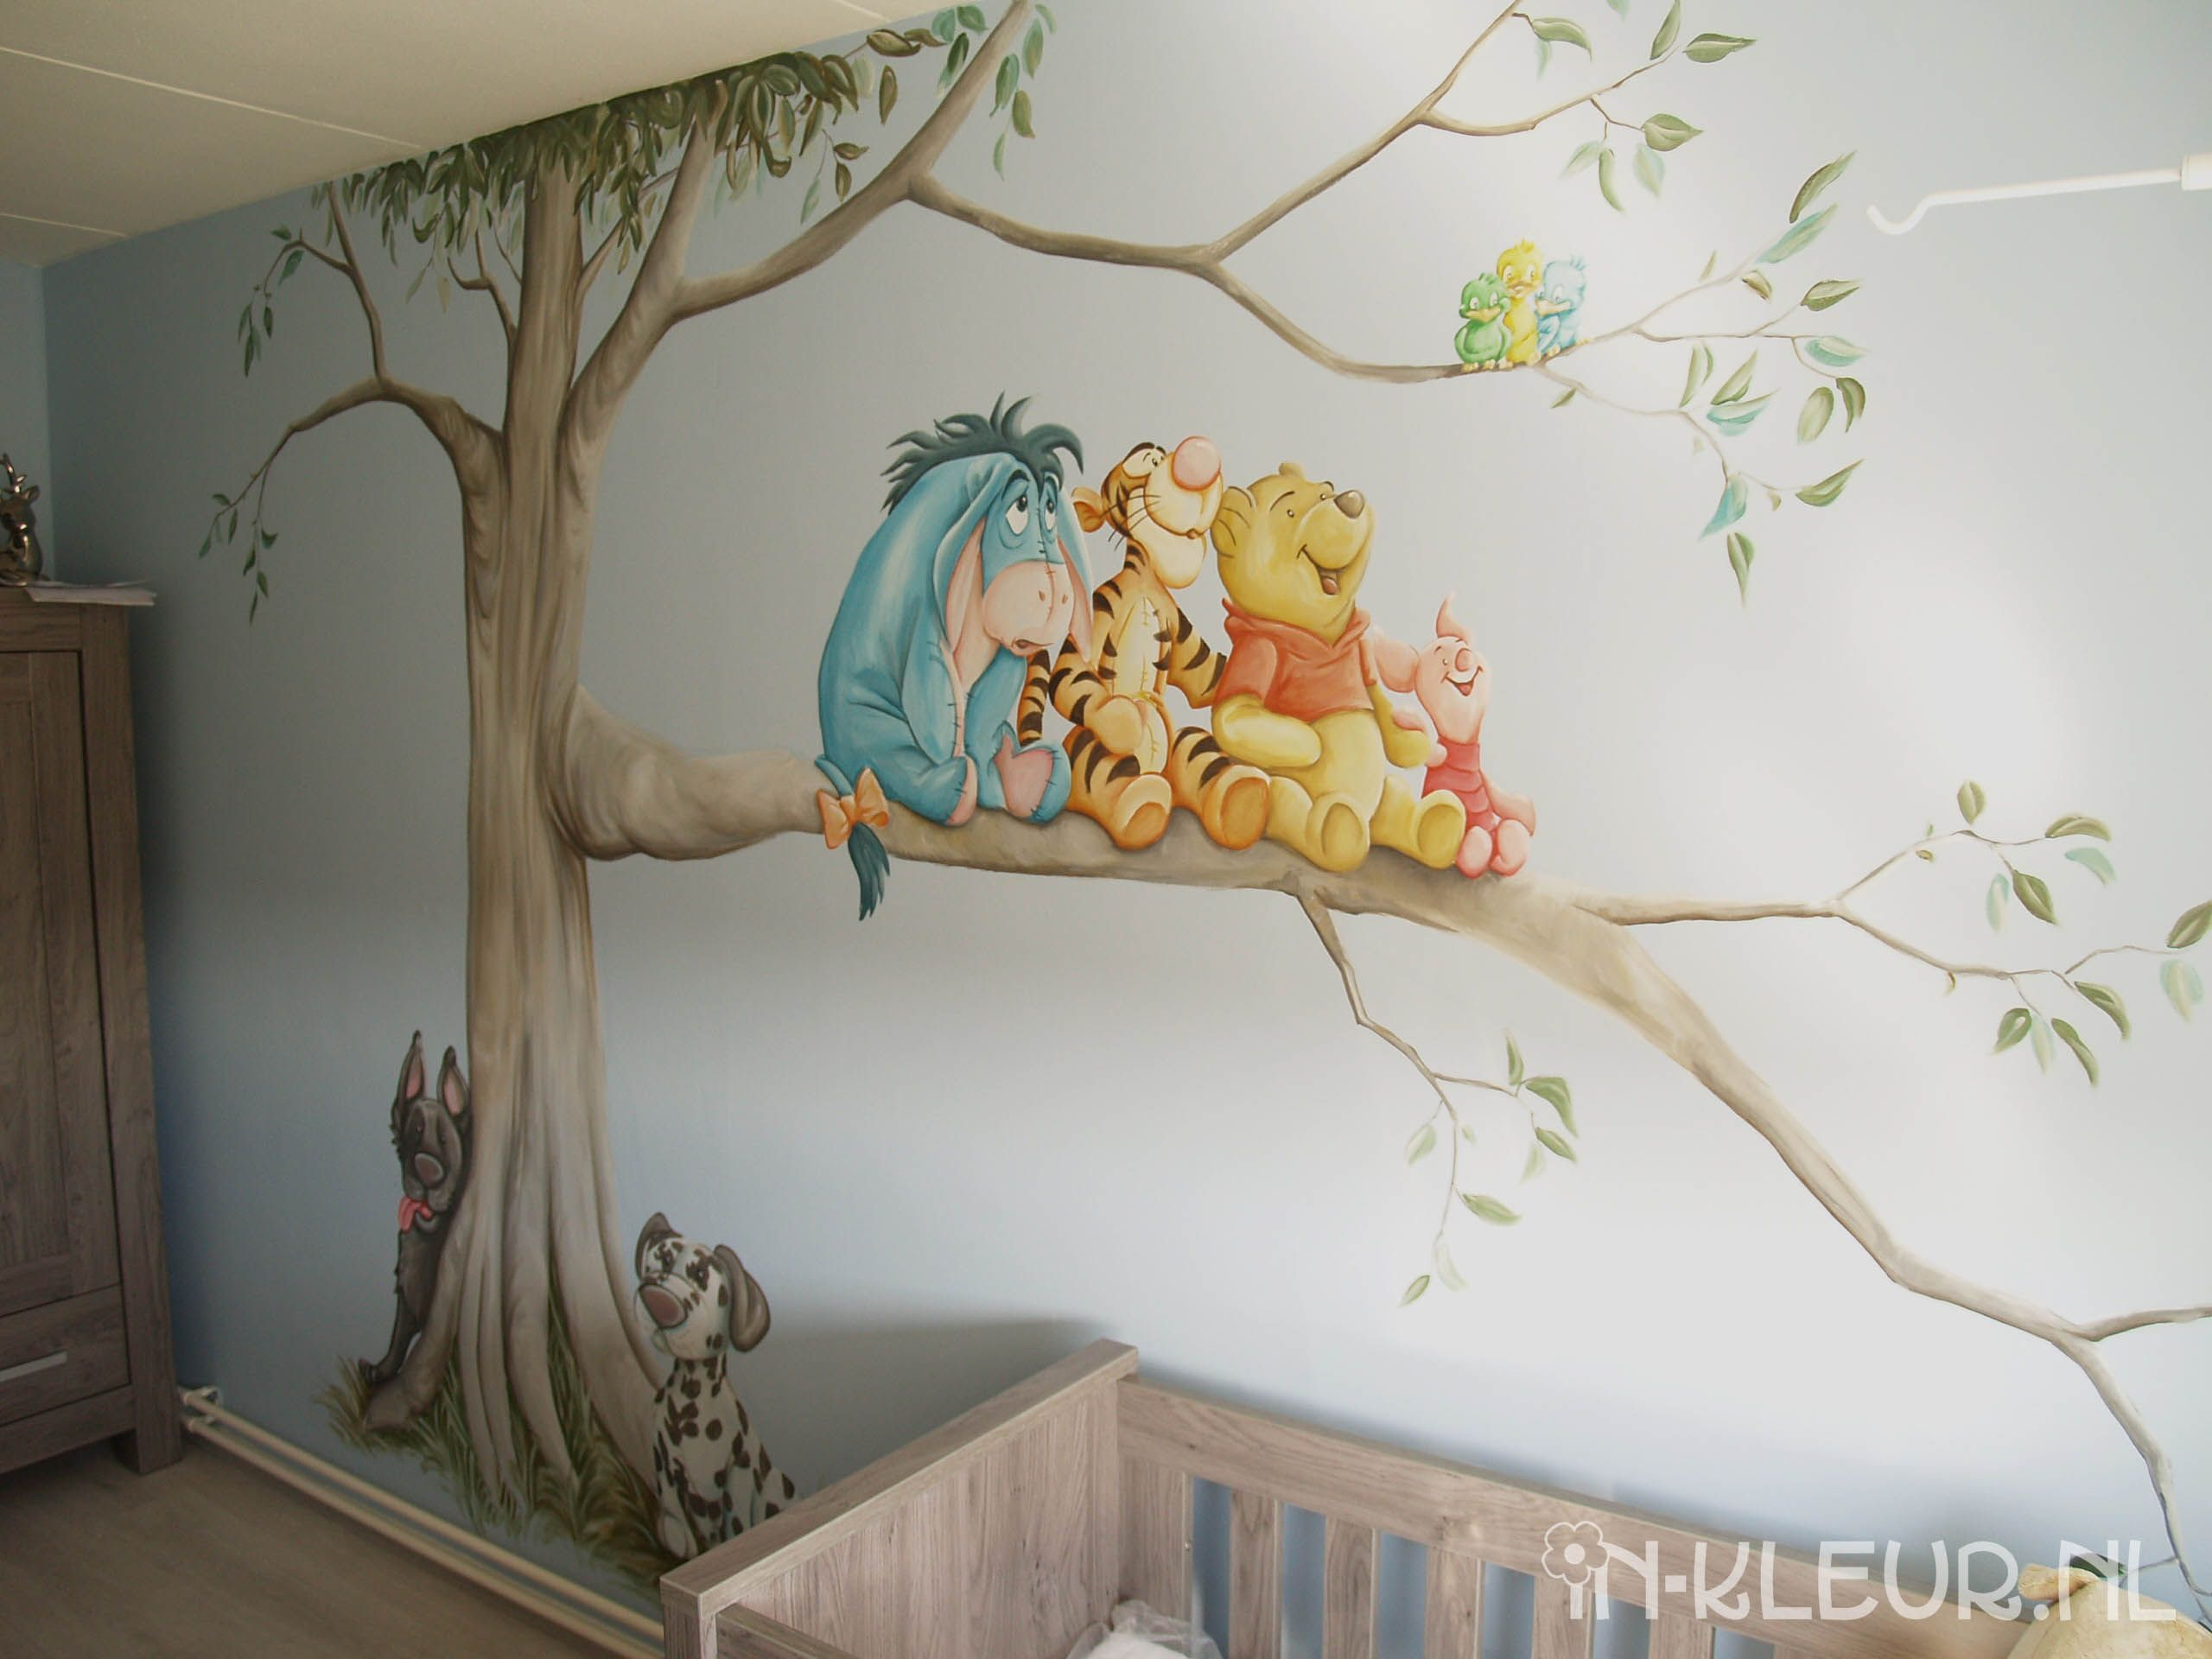 Výsledek Obrázku Pro Bambi Wall Mural